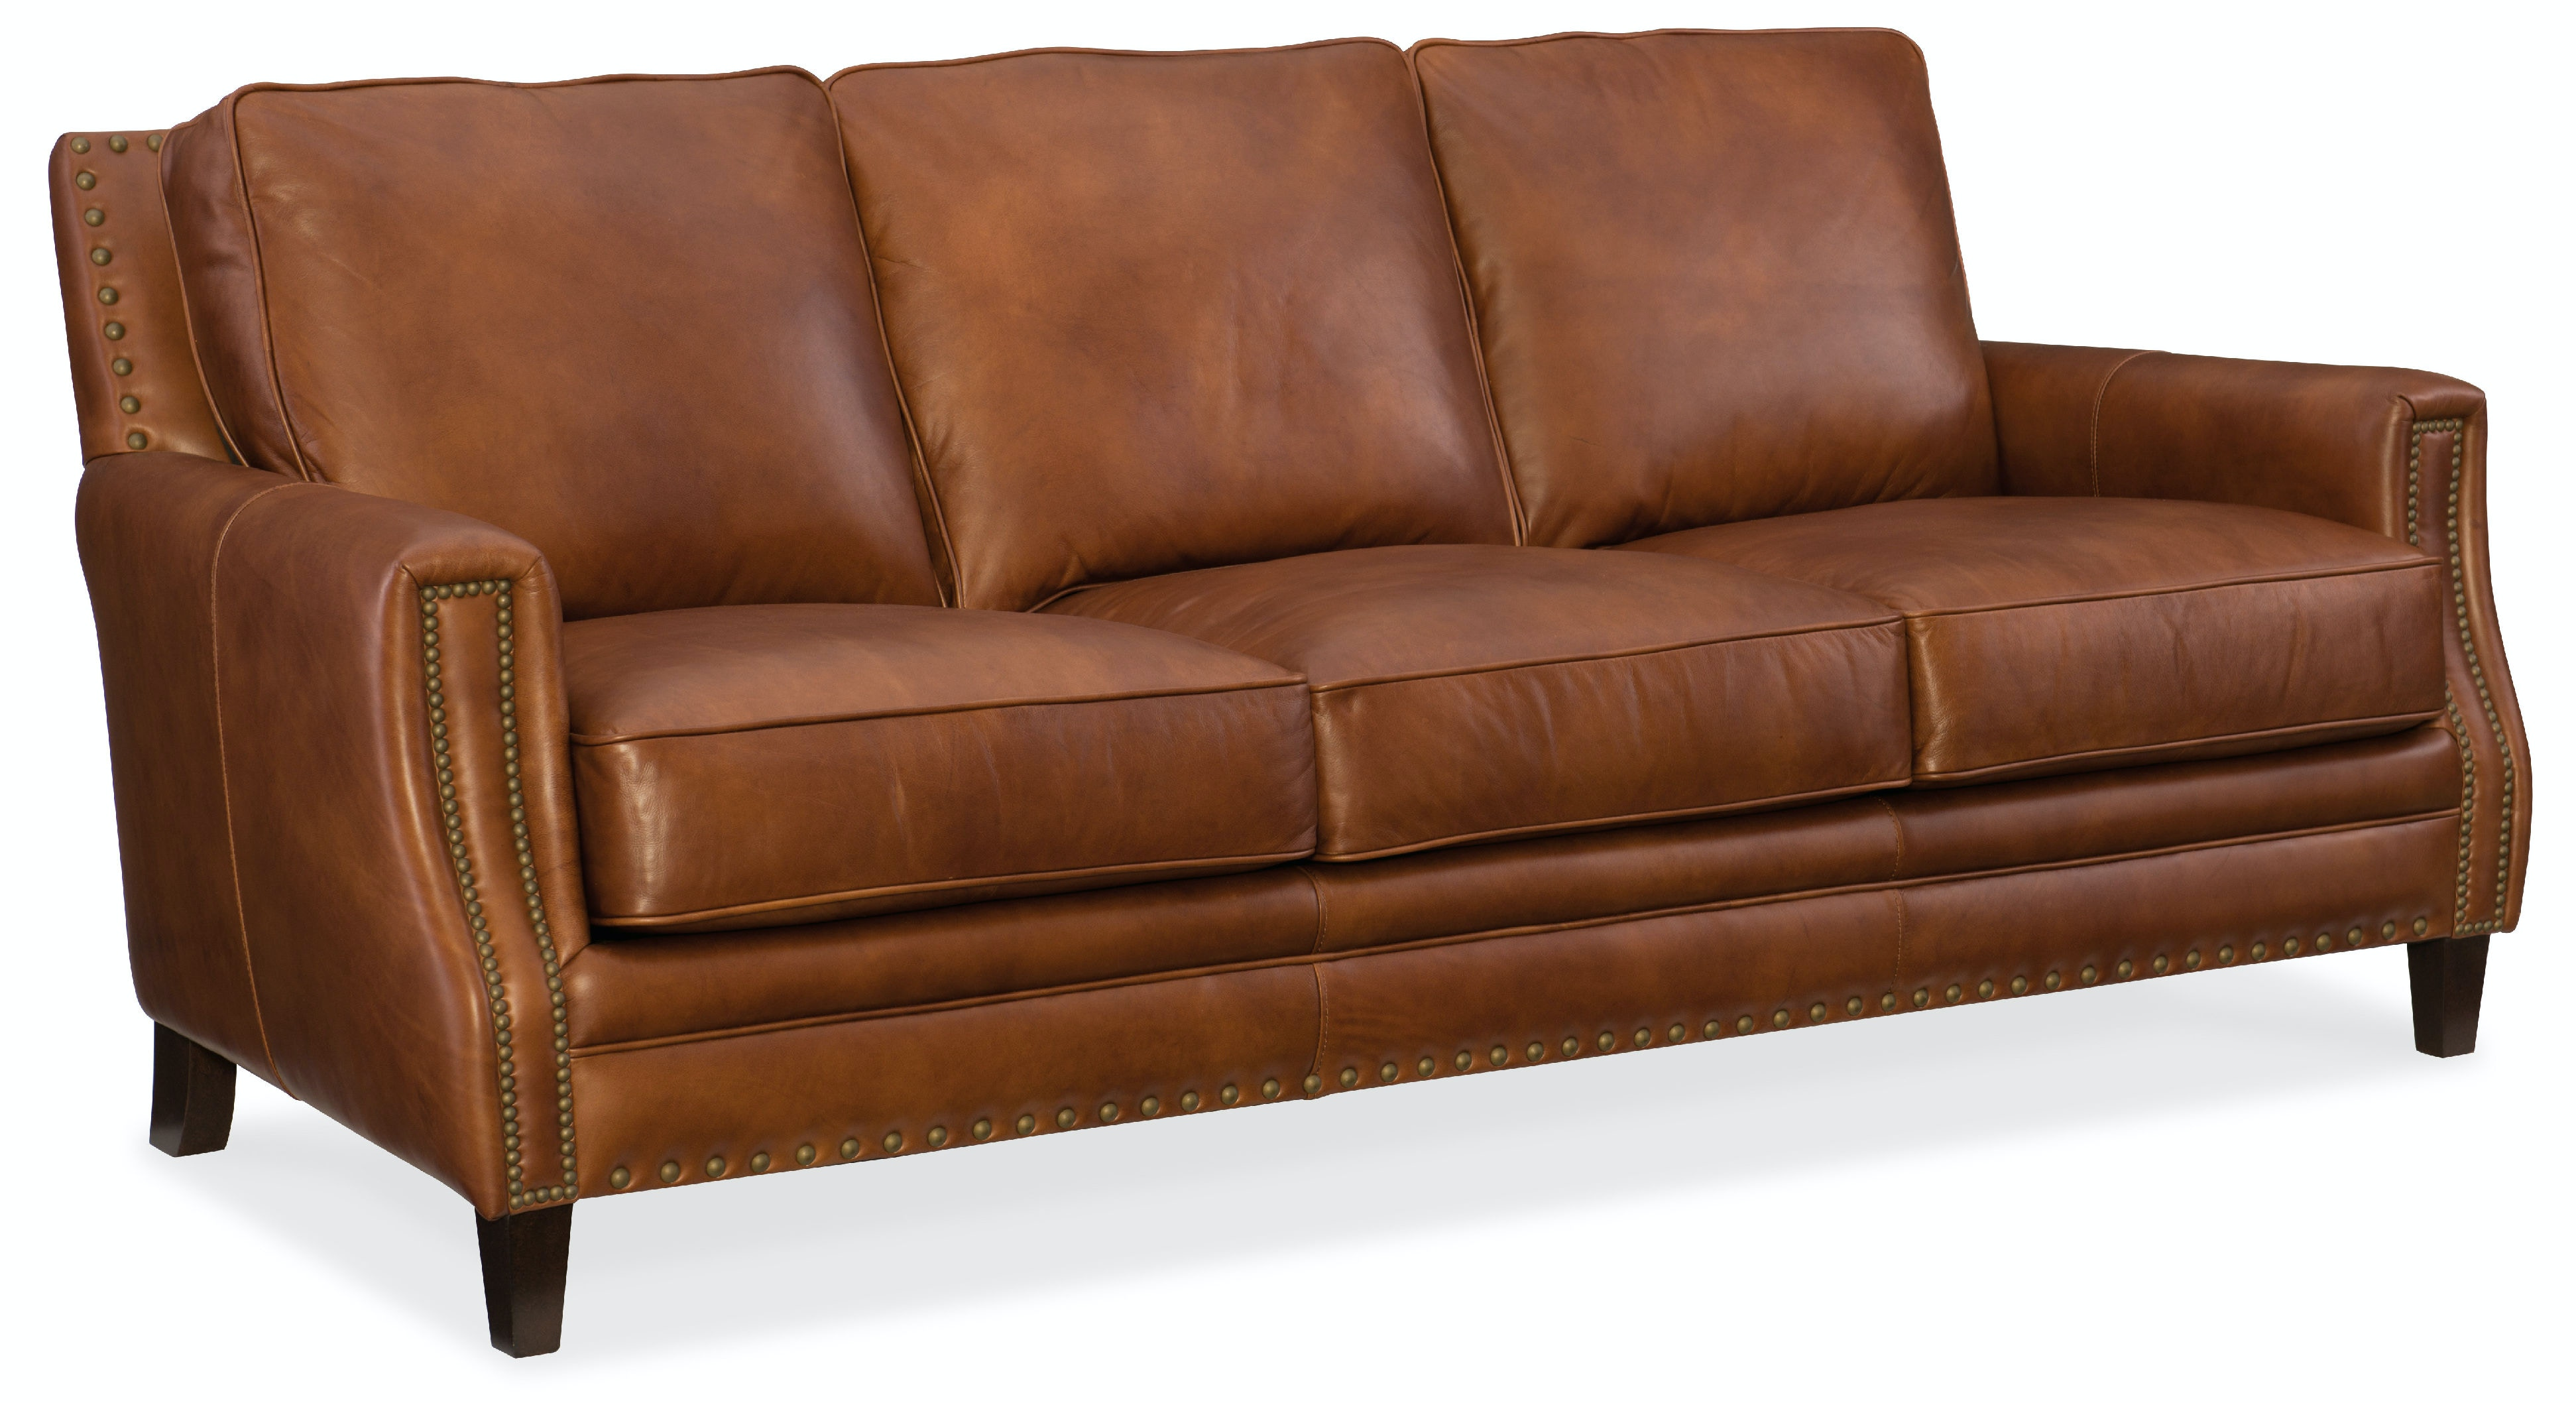 Hooker Furniture Exton Stationary Sofa SS387 03 087